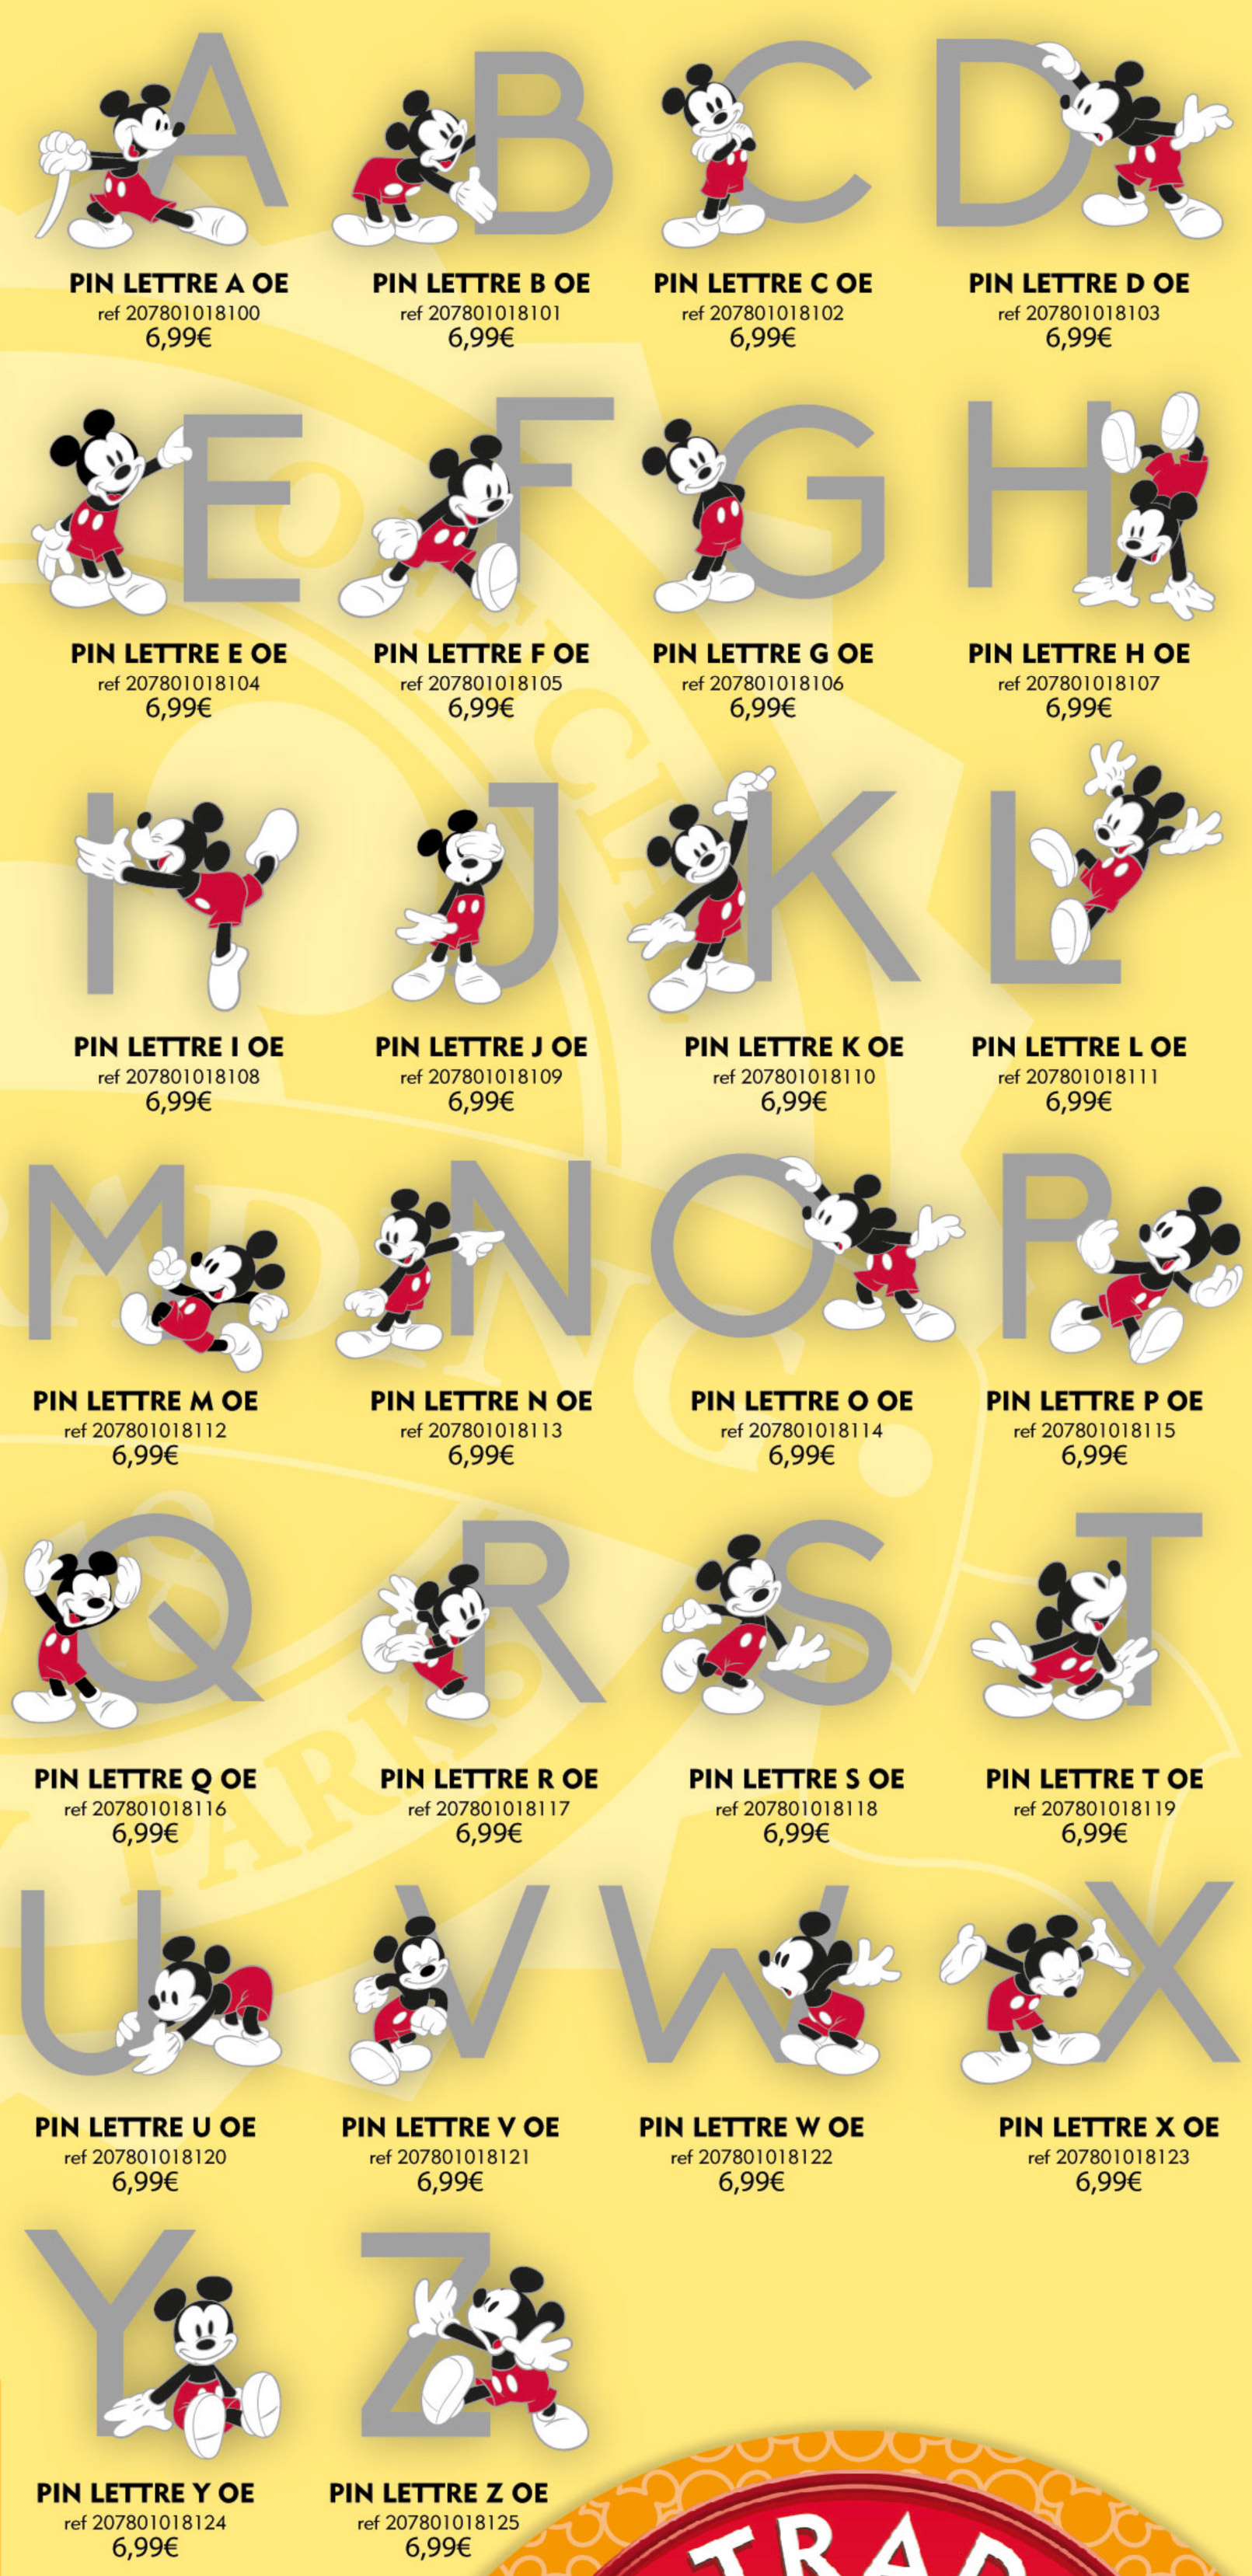 Disneyland Paris Pins For July 7th 2018